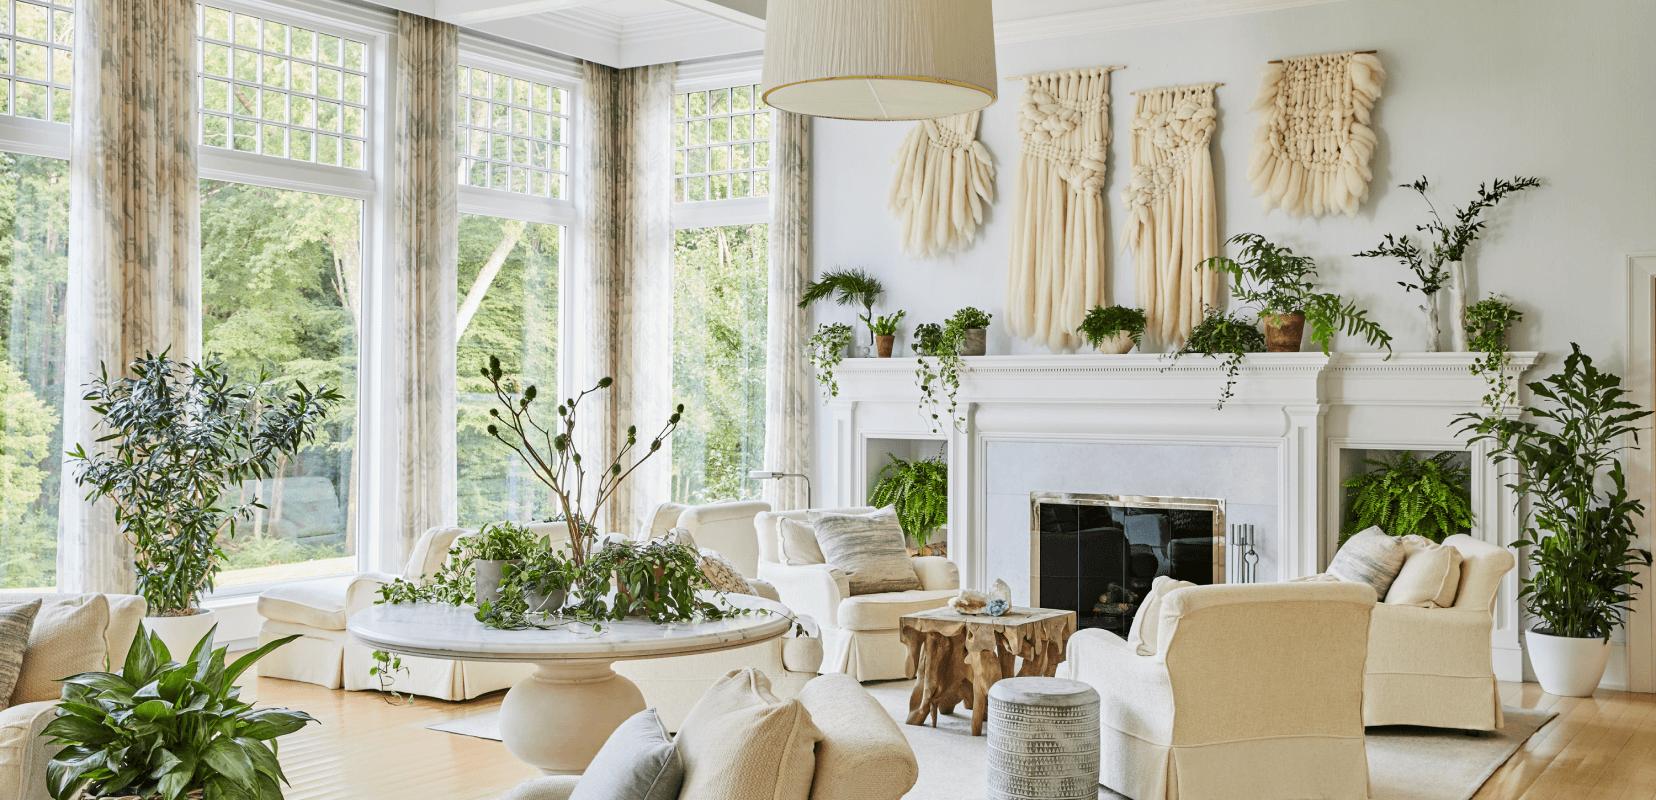 lovely room interior